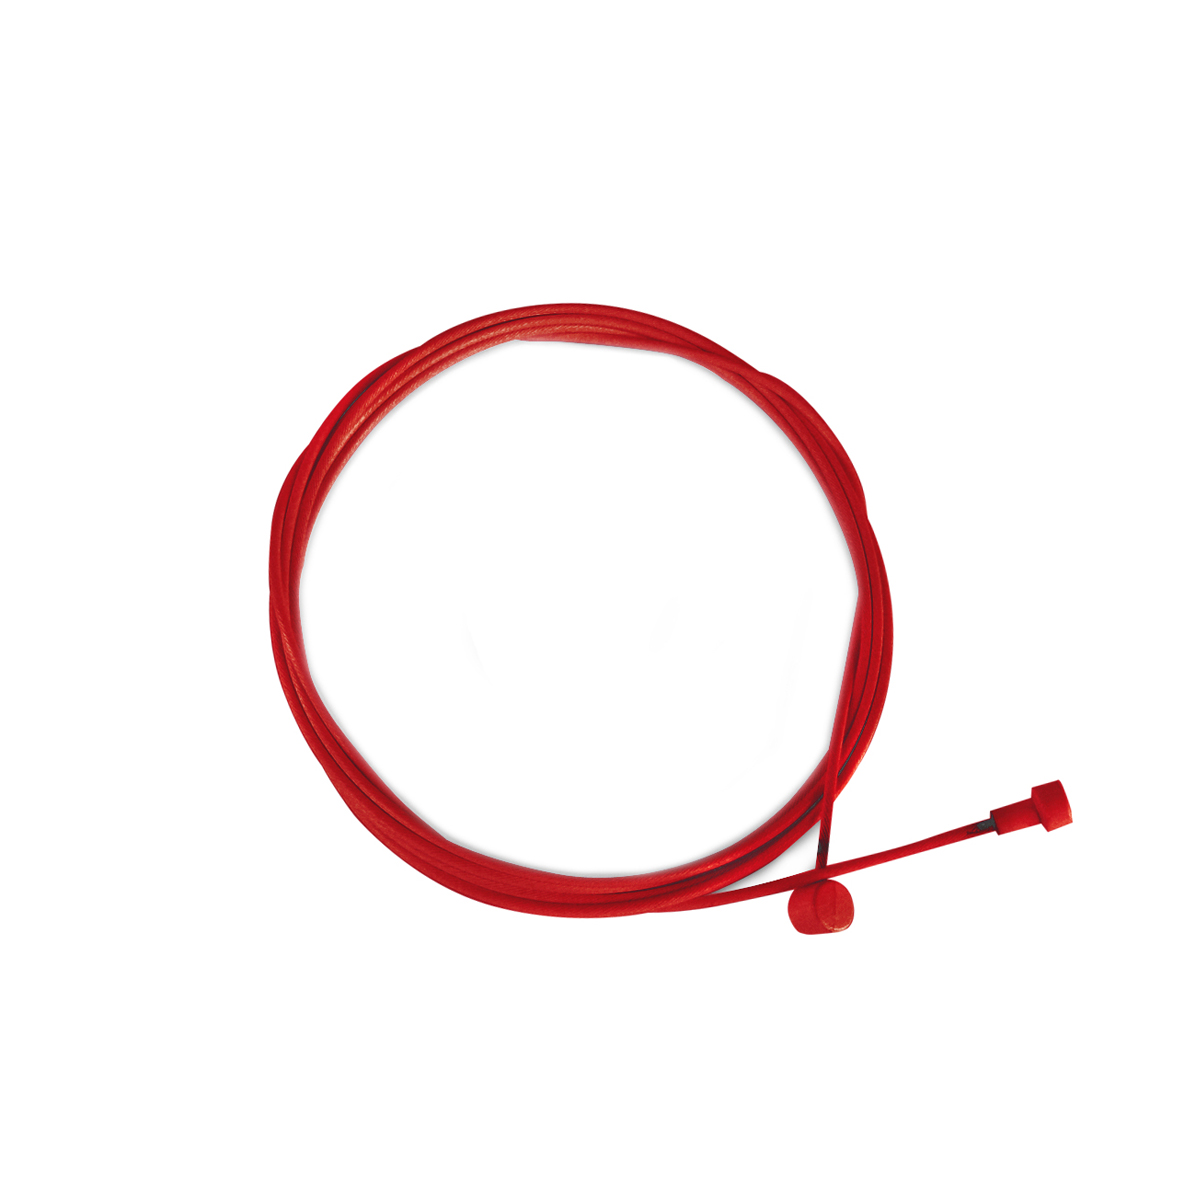 Câble de frein Alligator acier galvanisé 1700x1,6 mm Rouge